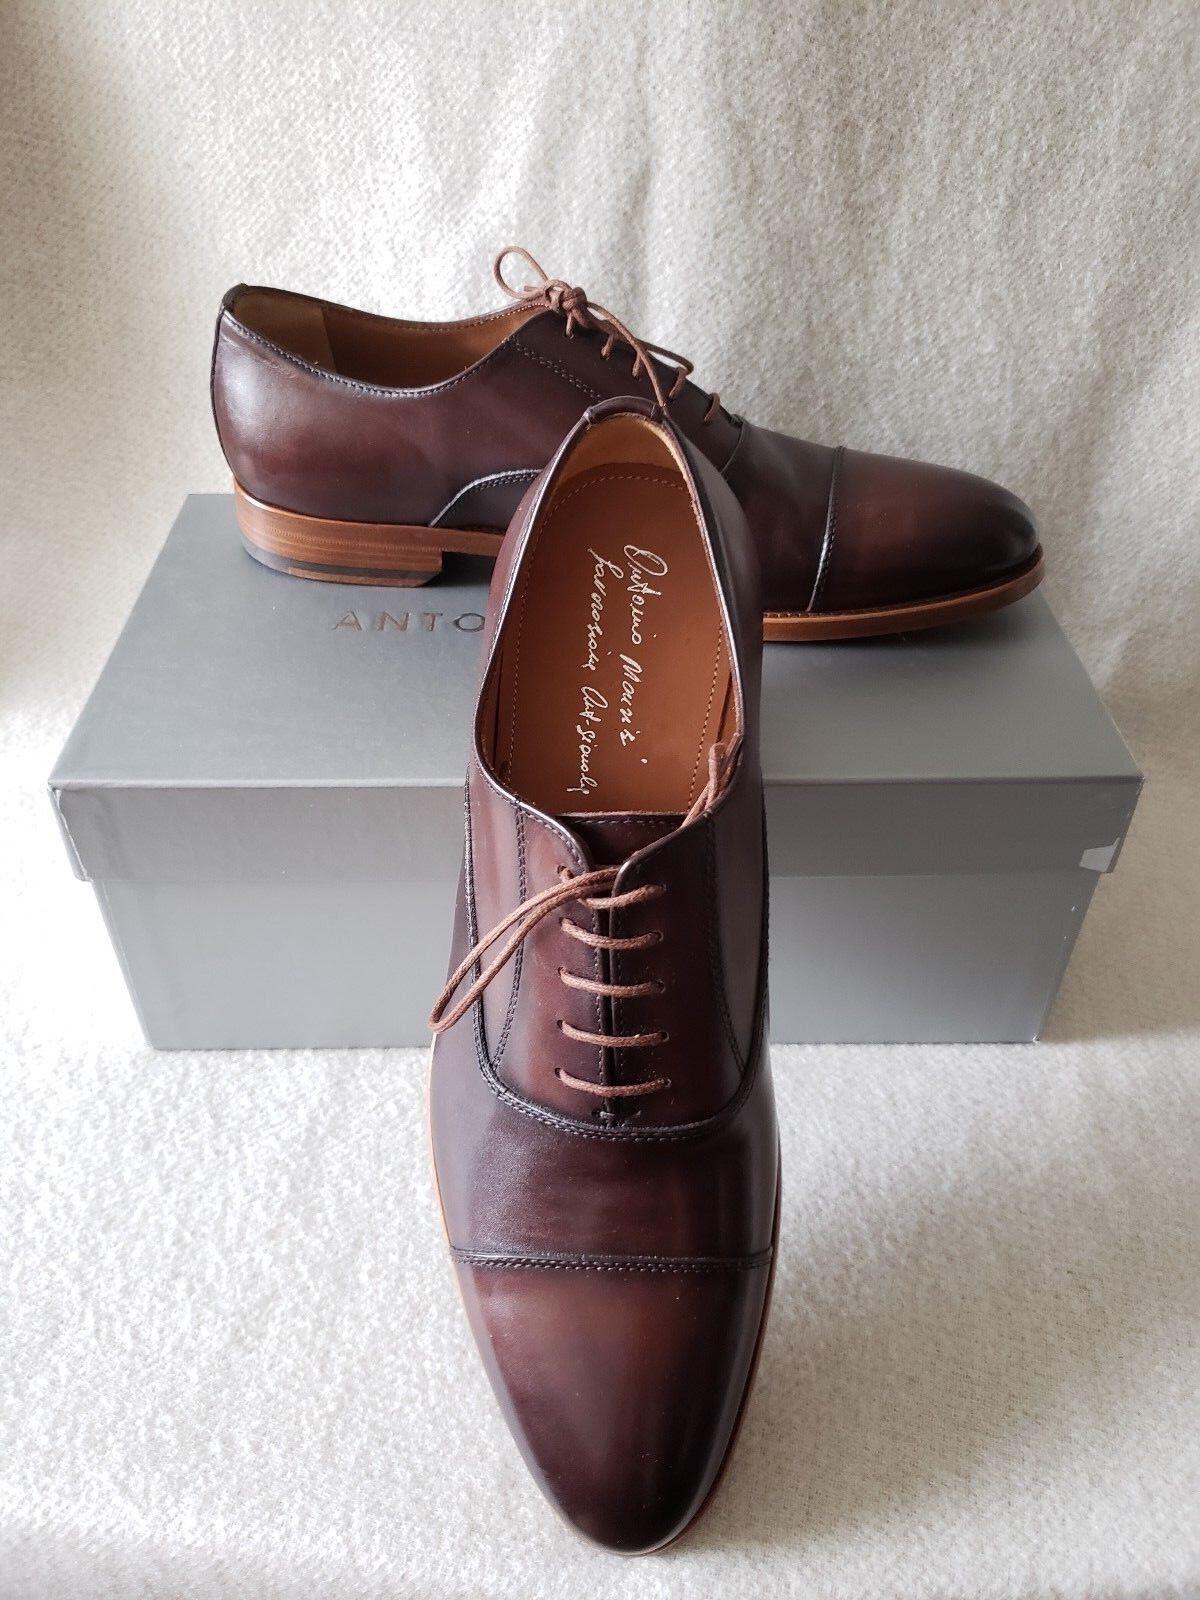 New Antonio Maurizi 9 US 42 EU Cap Toe Oxford Lace Up Burnished Leather Brown